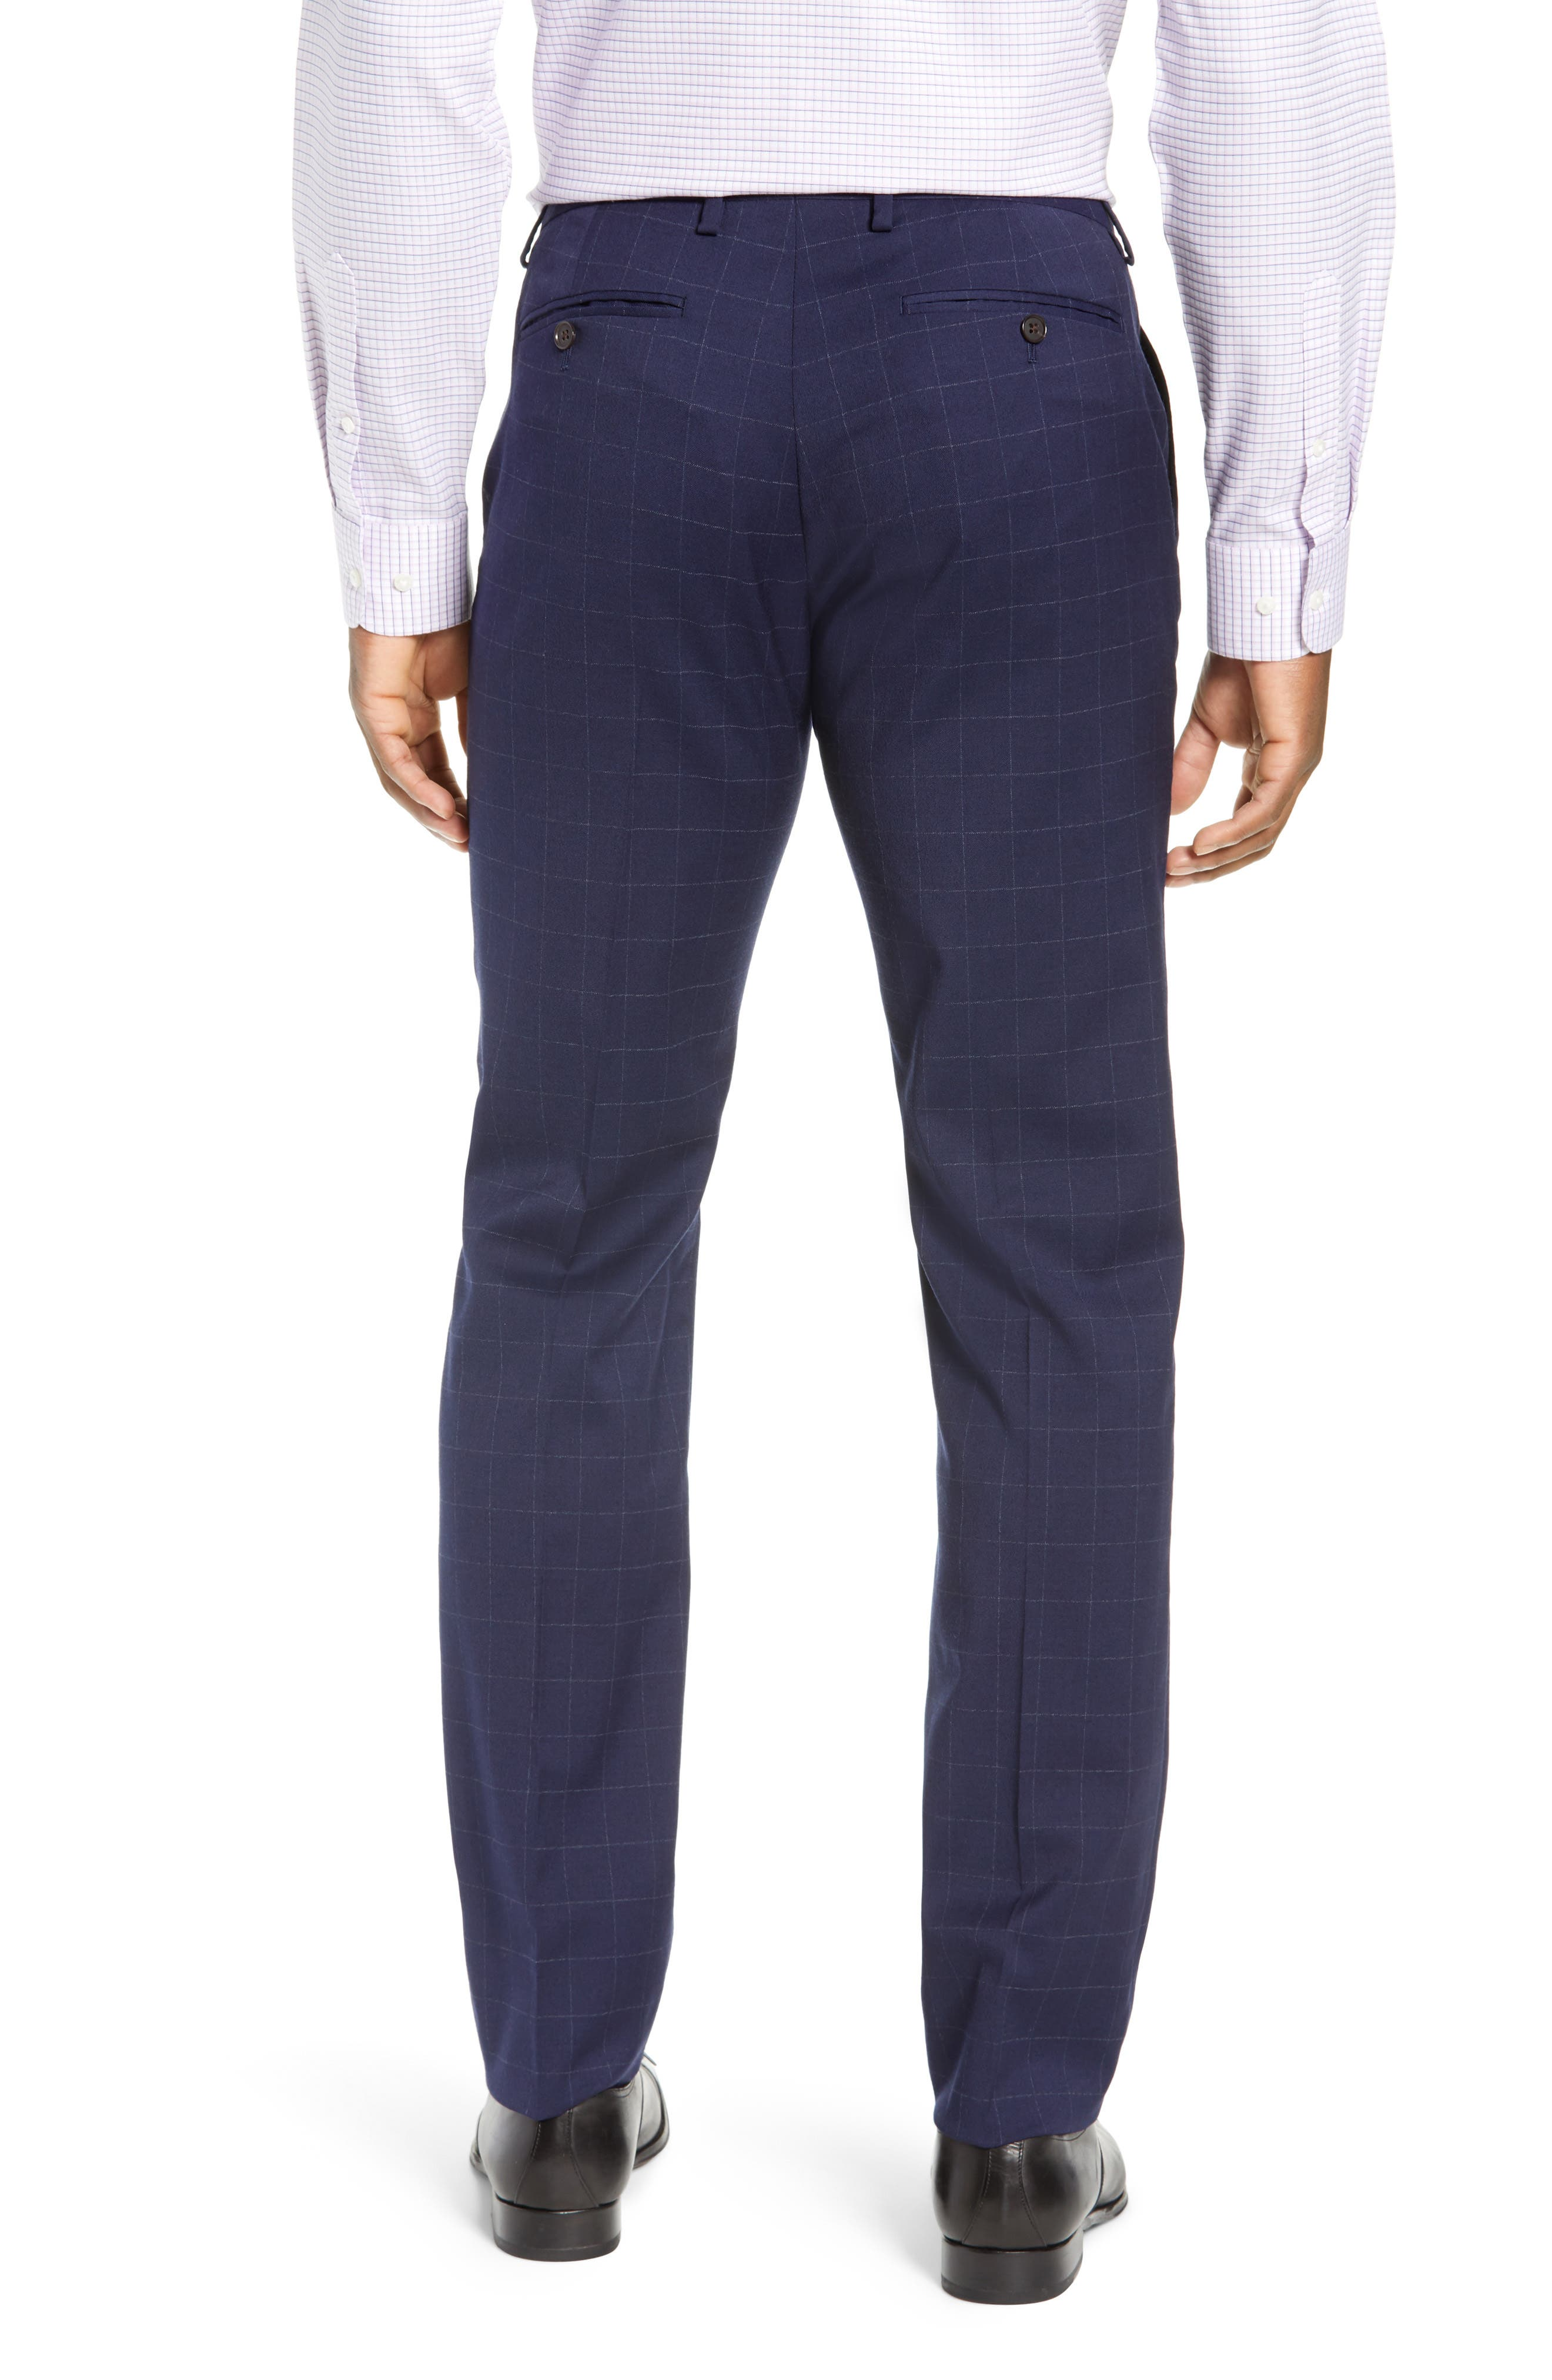 Jetsetter Slim Fit Stretch Suit Pants,                             Alternate thumbnail 2, color,                             NAVY CHALK WINDOWPANE